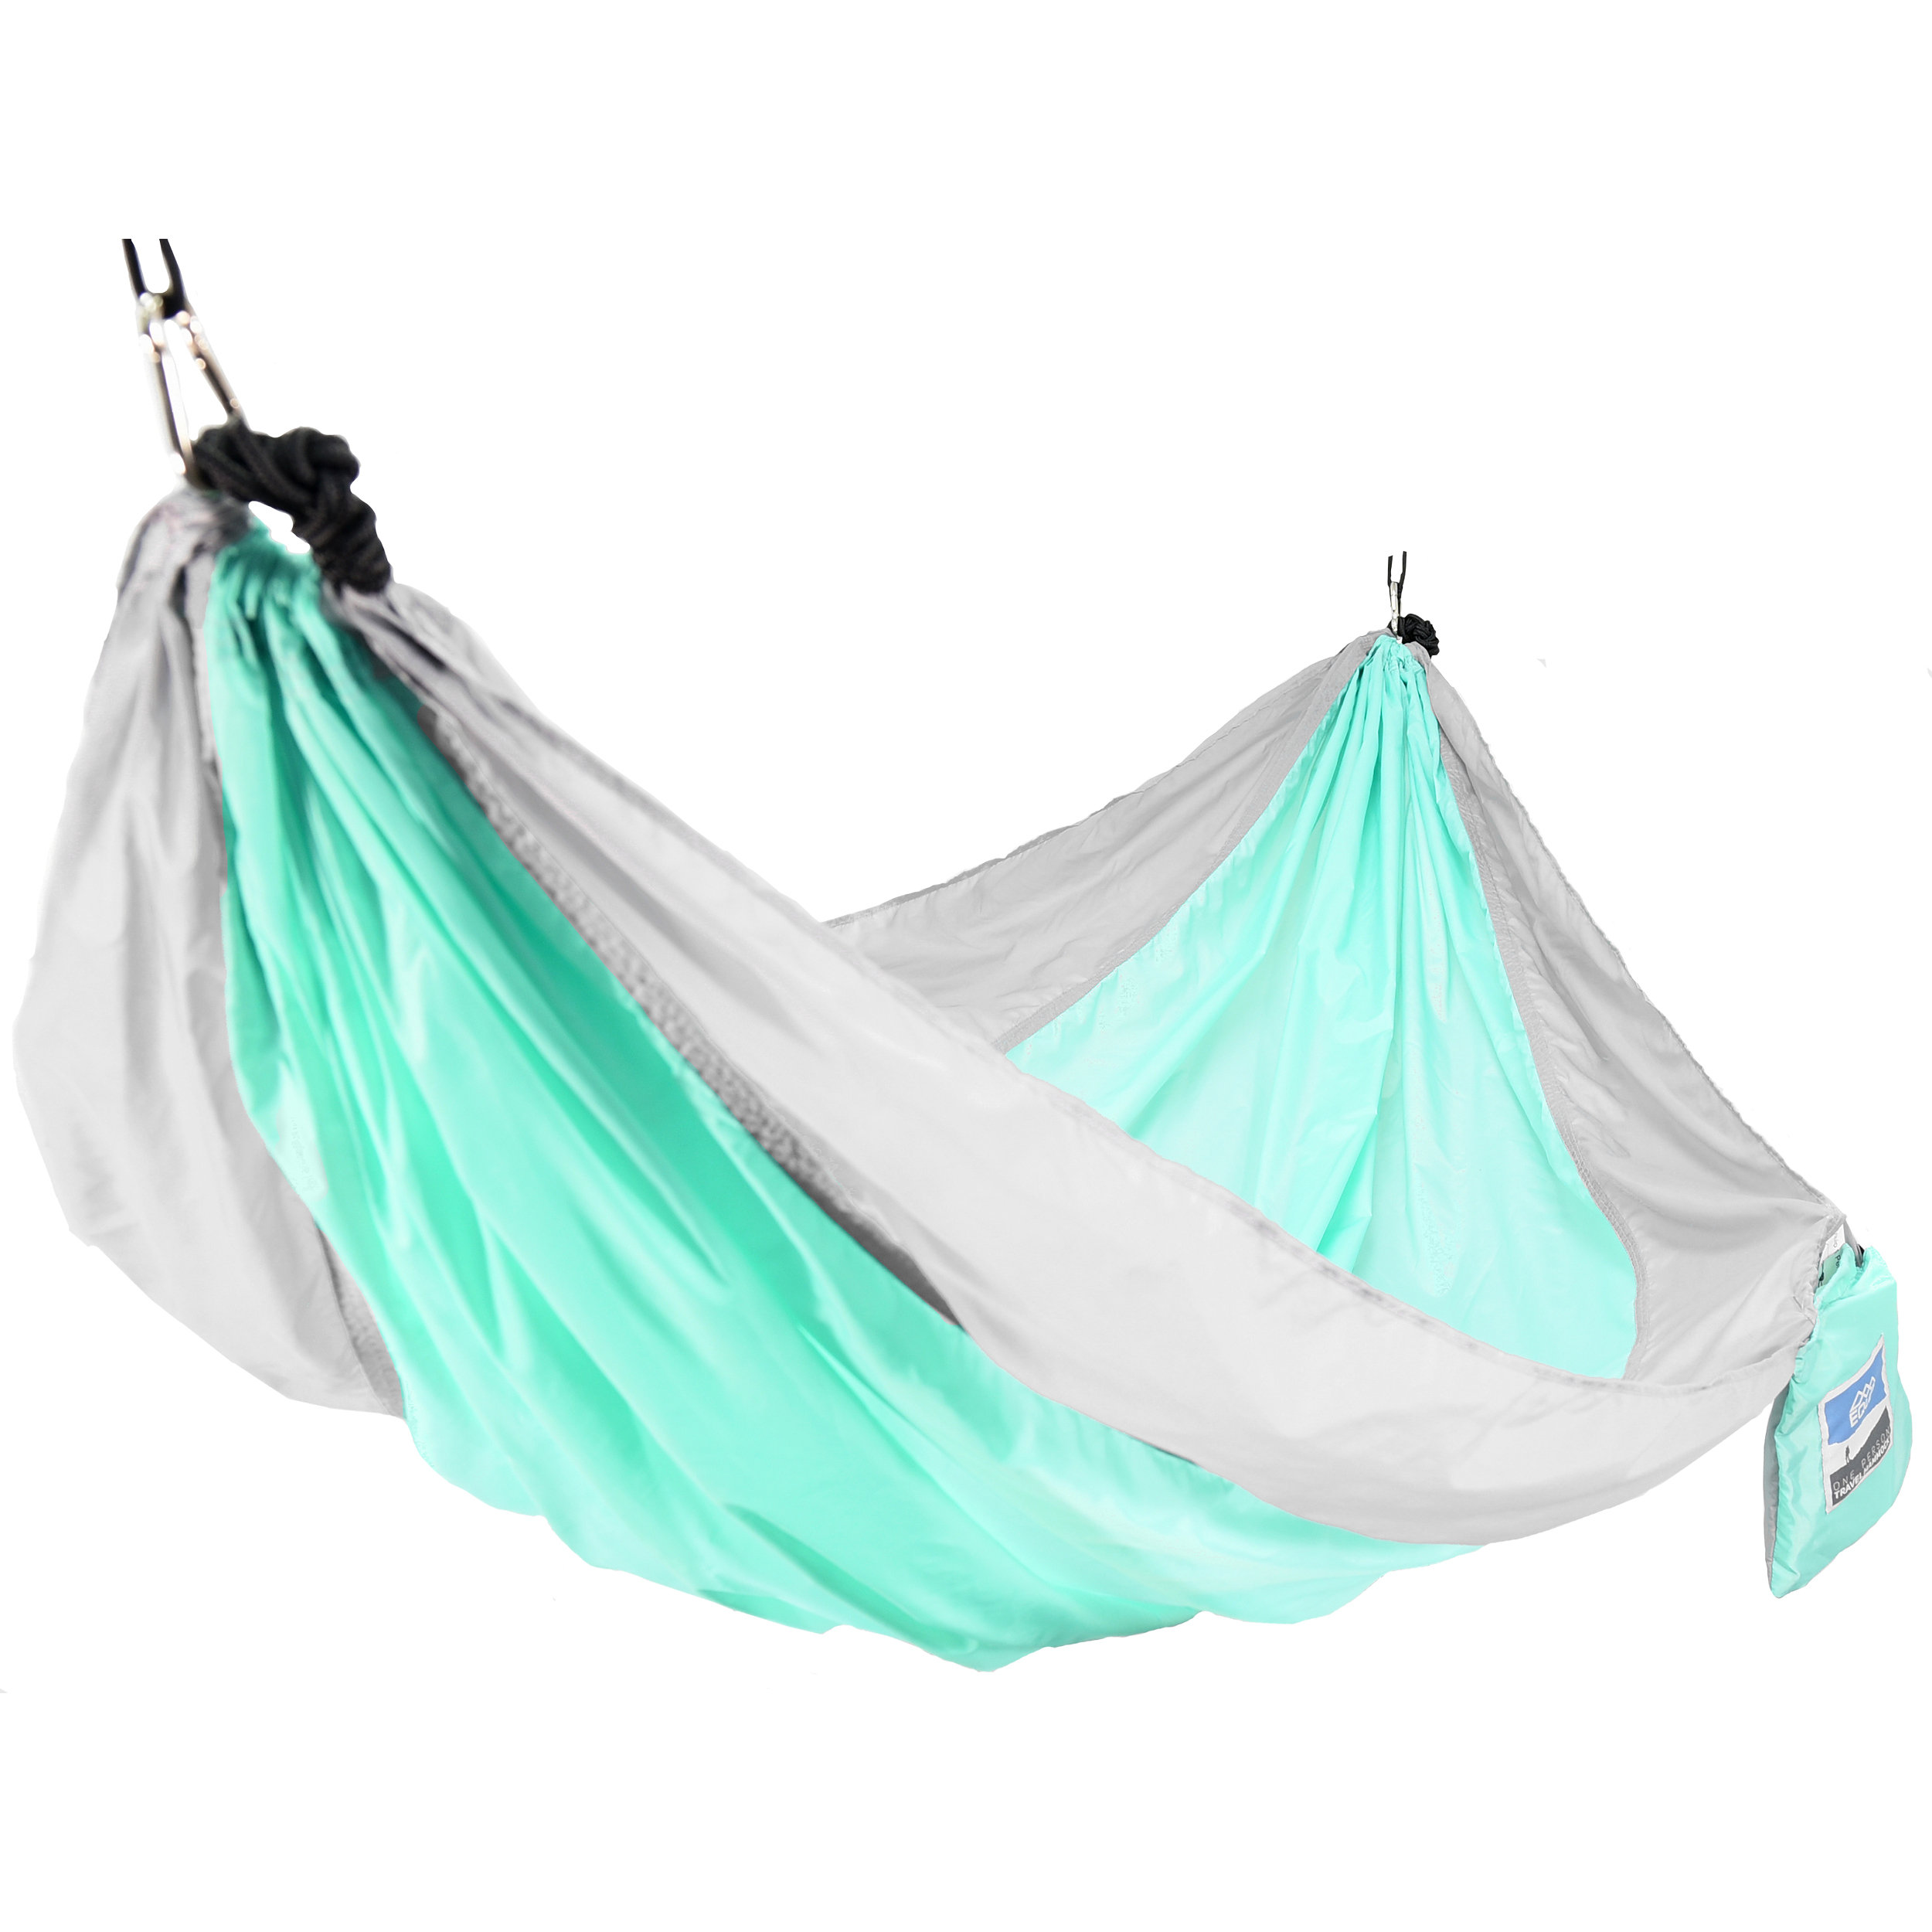 olivier en terracotta hammock hammocks category exped plus travel switzerland product travelhammockplus